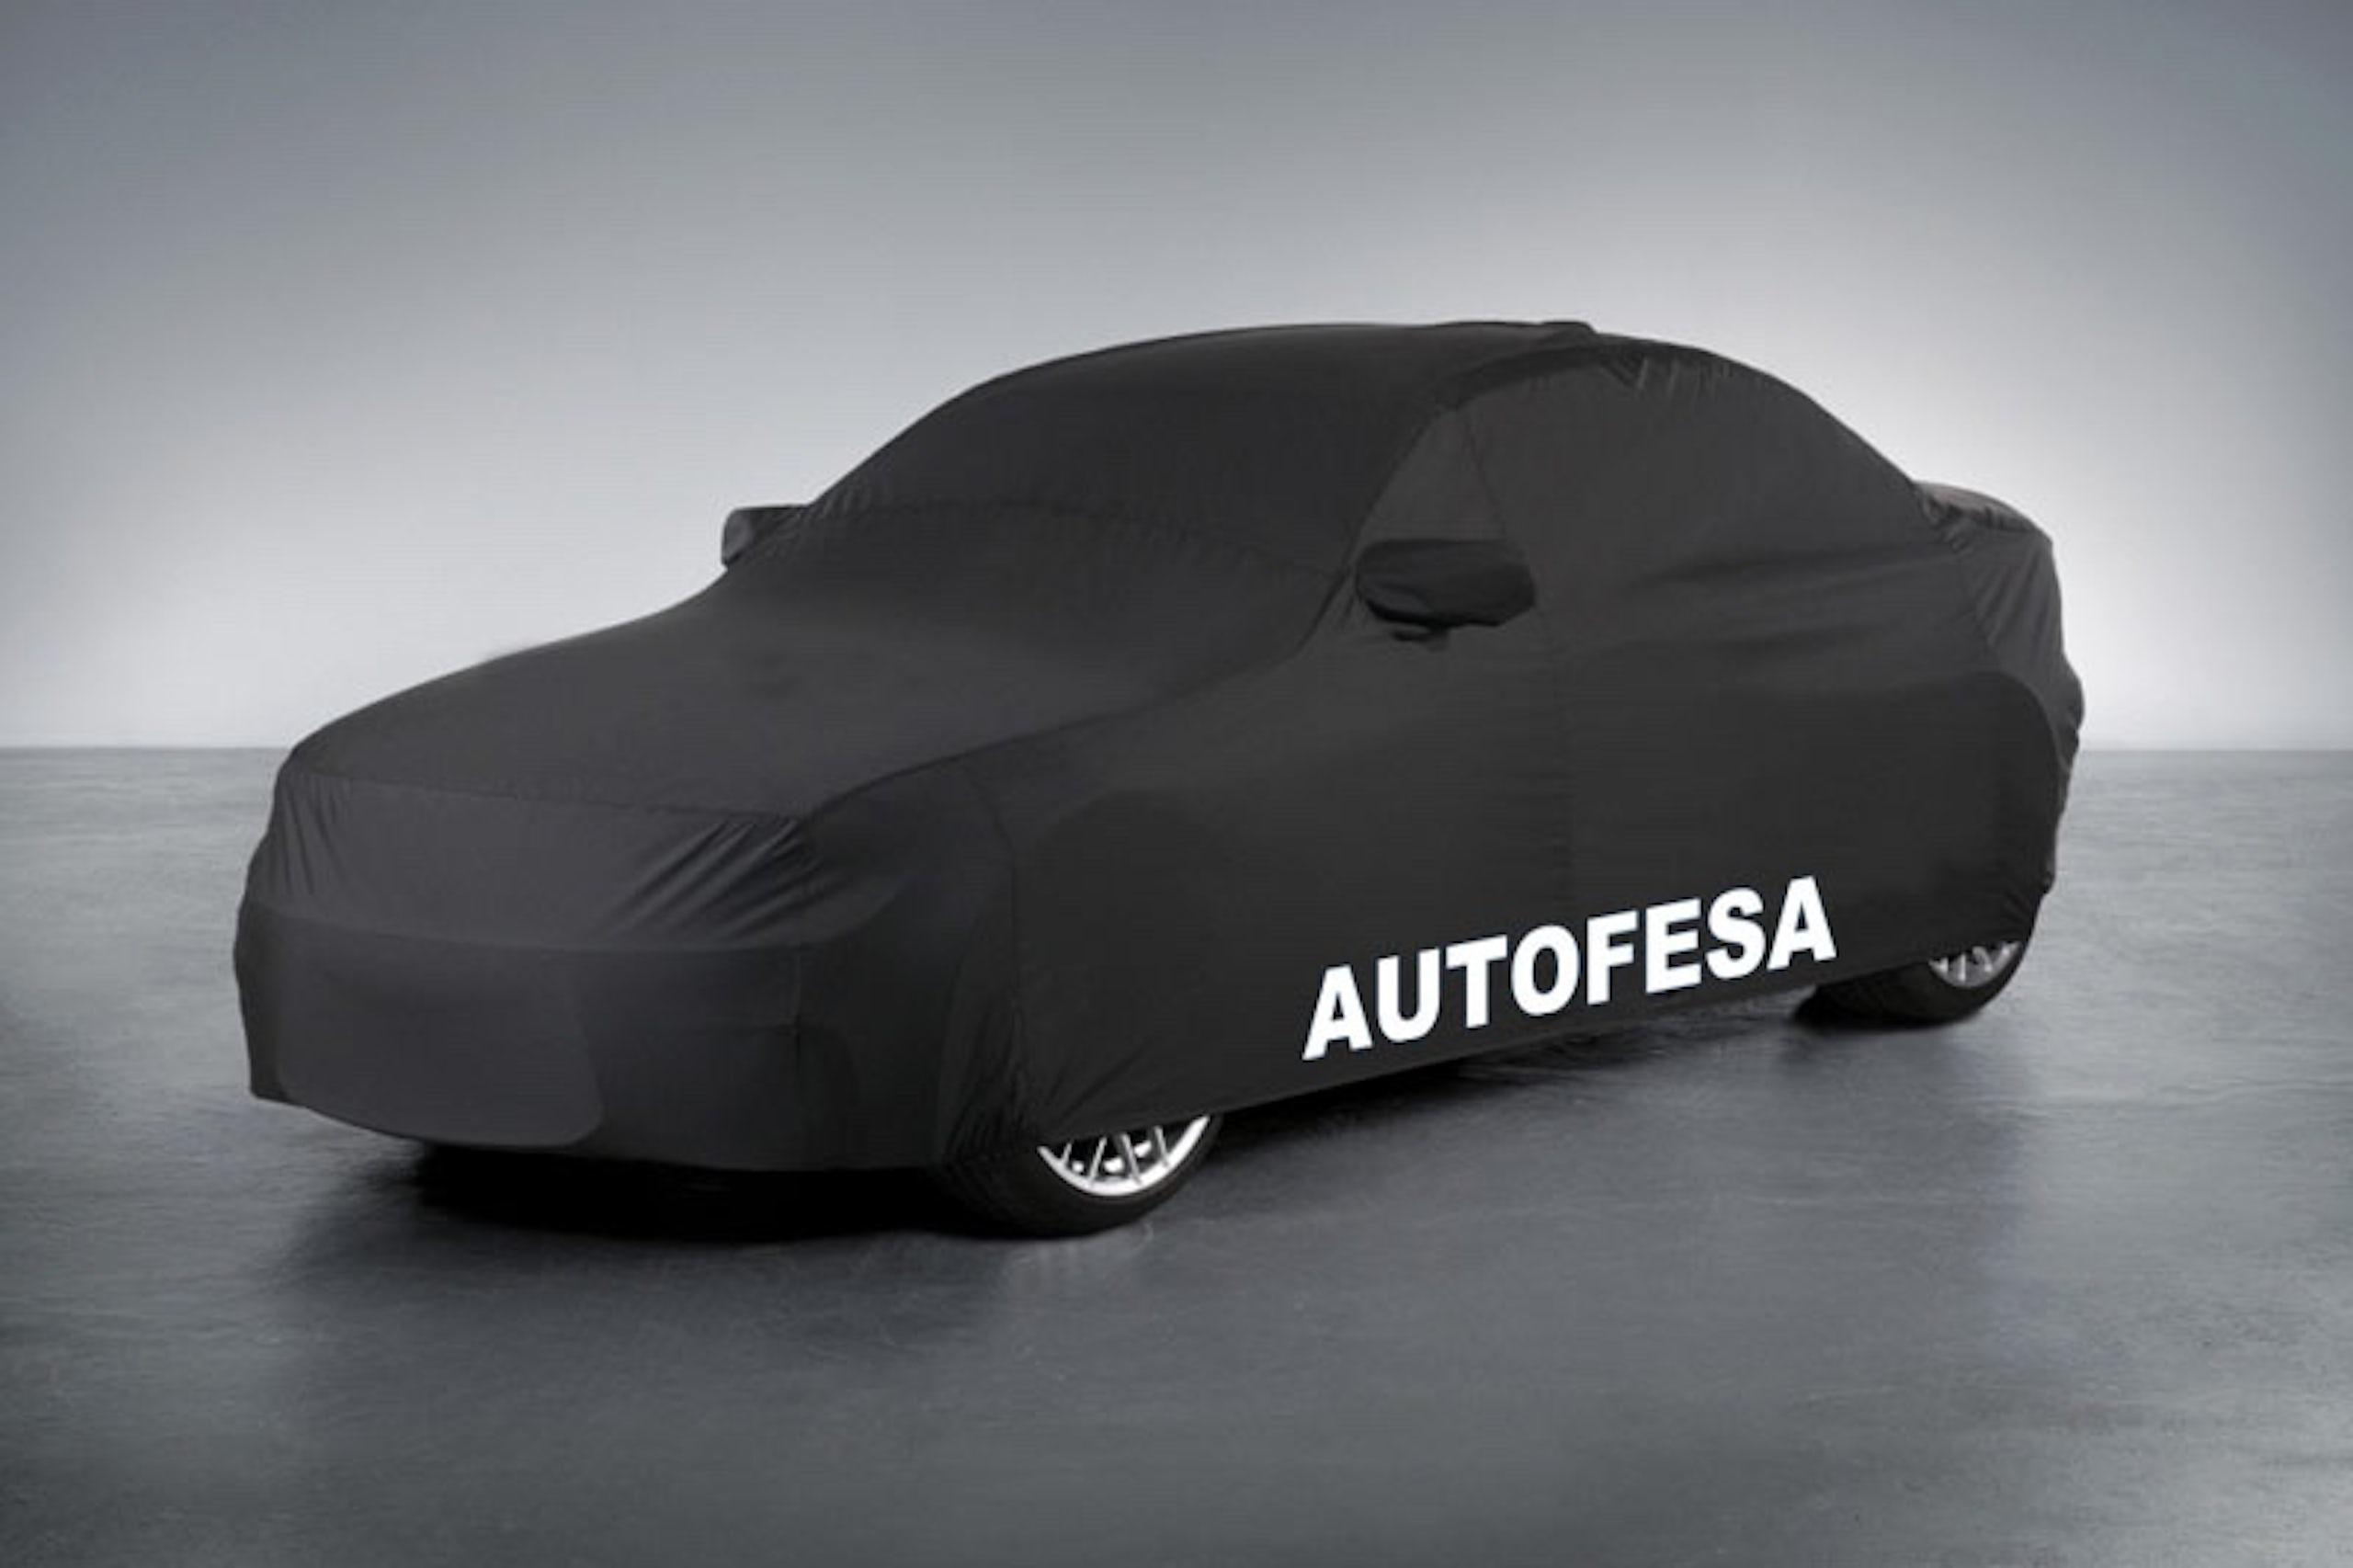 Audi A6 A6Avant COMPETITION ABT 3.0 TDI V6 T 326cv quattro 5p S tronic 4x4 Cpmpetition ABT S/S - Foto 1